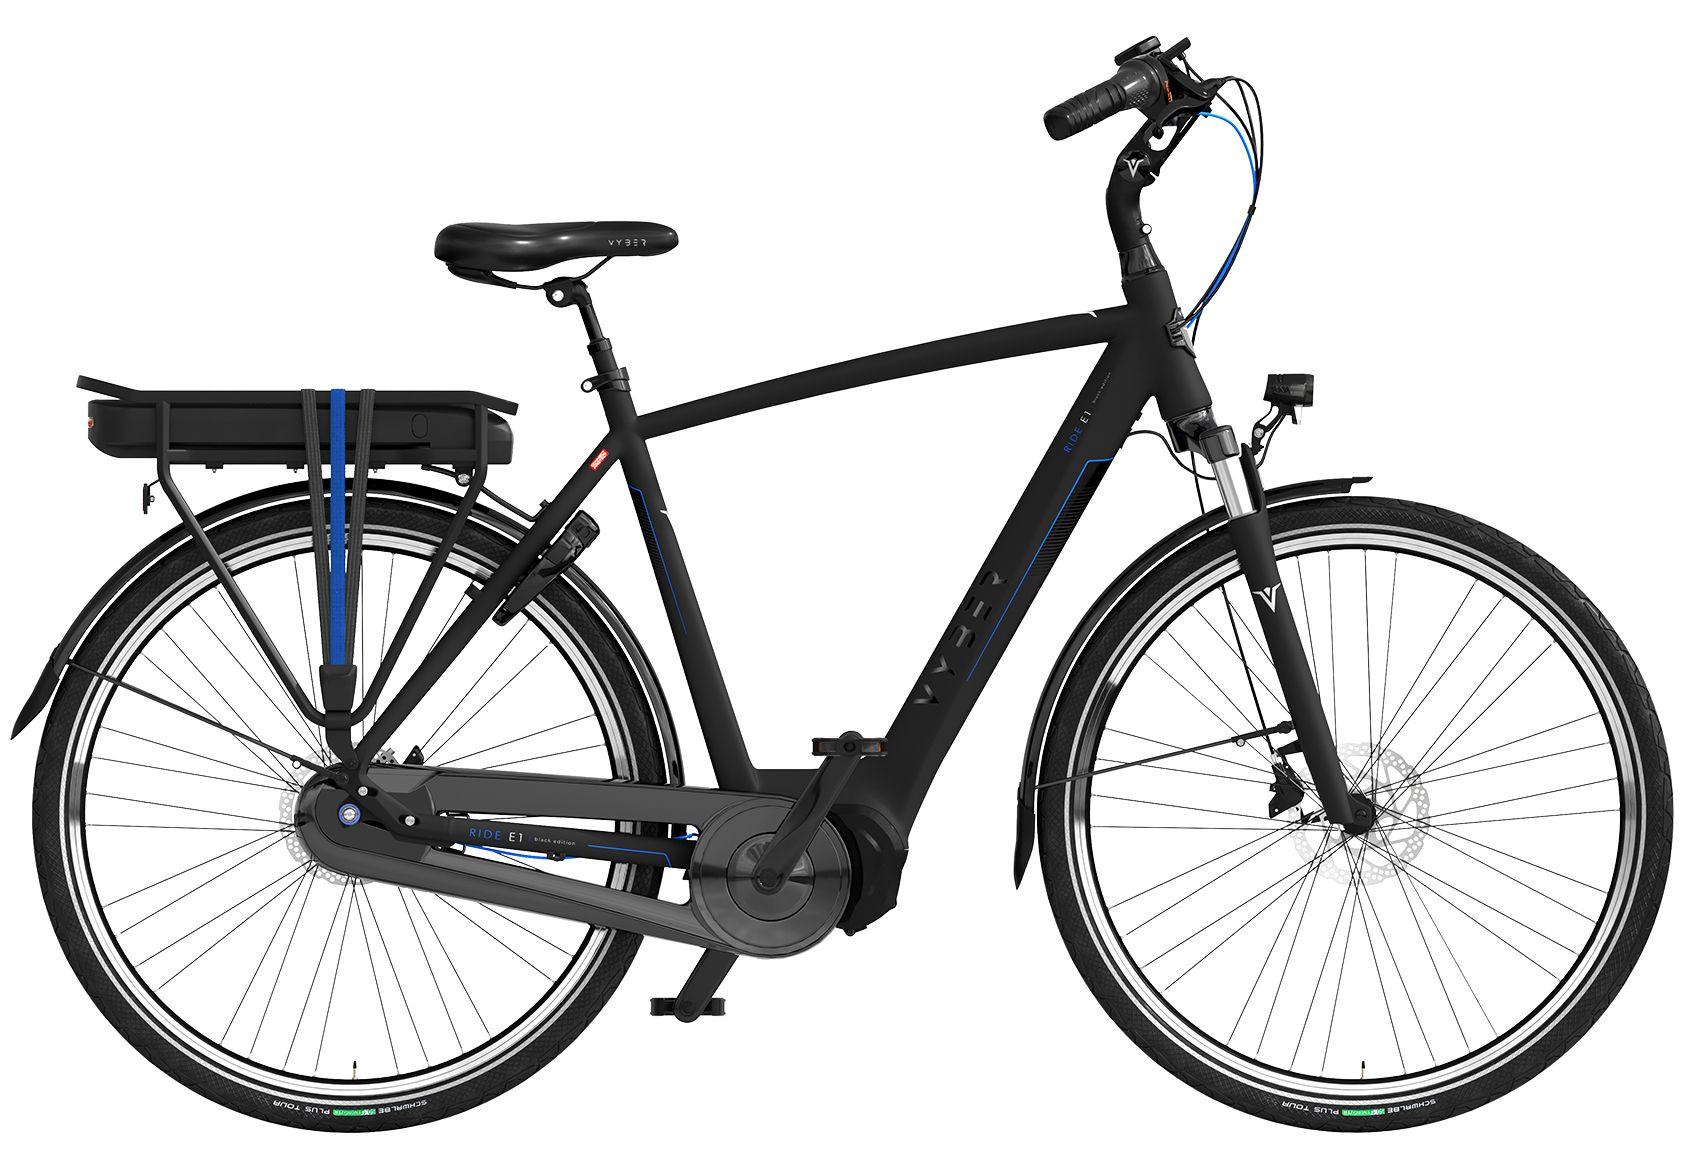 Vyber Ride E1 elektrische fiets